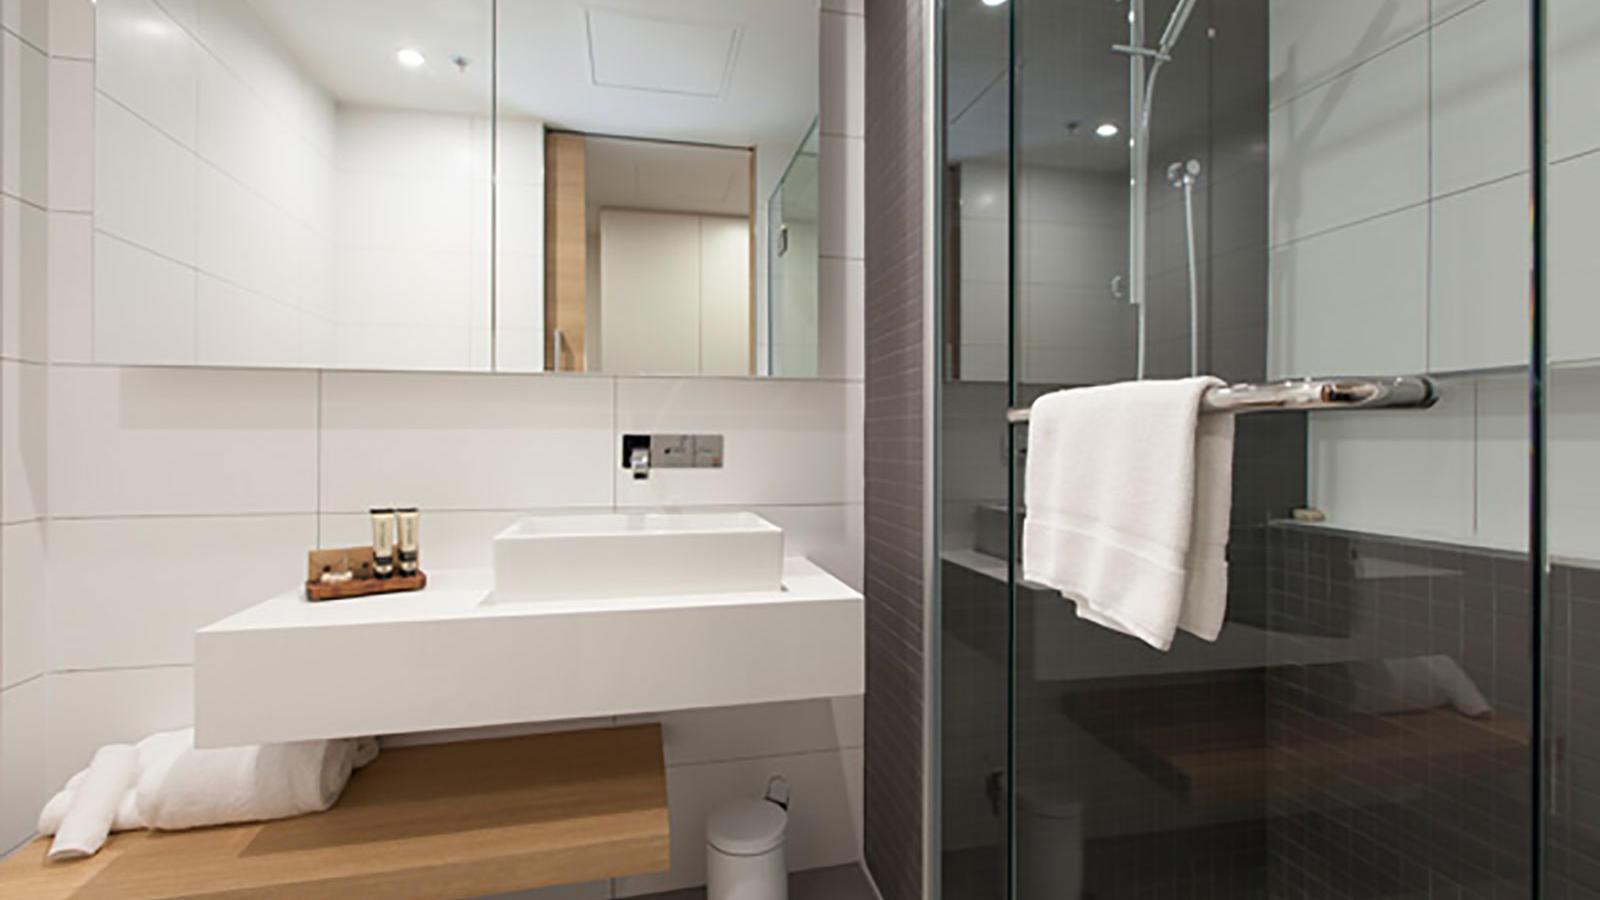 Bathroom of Family Suite at Jasper Hotel Melbourne